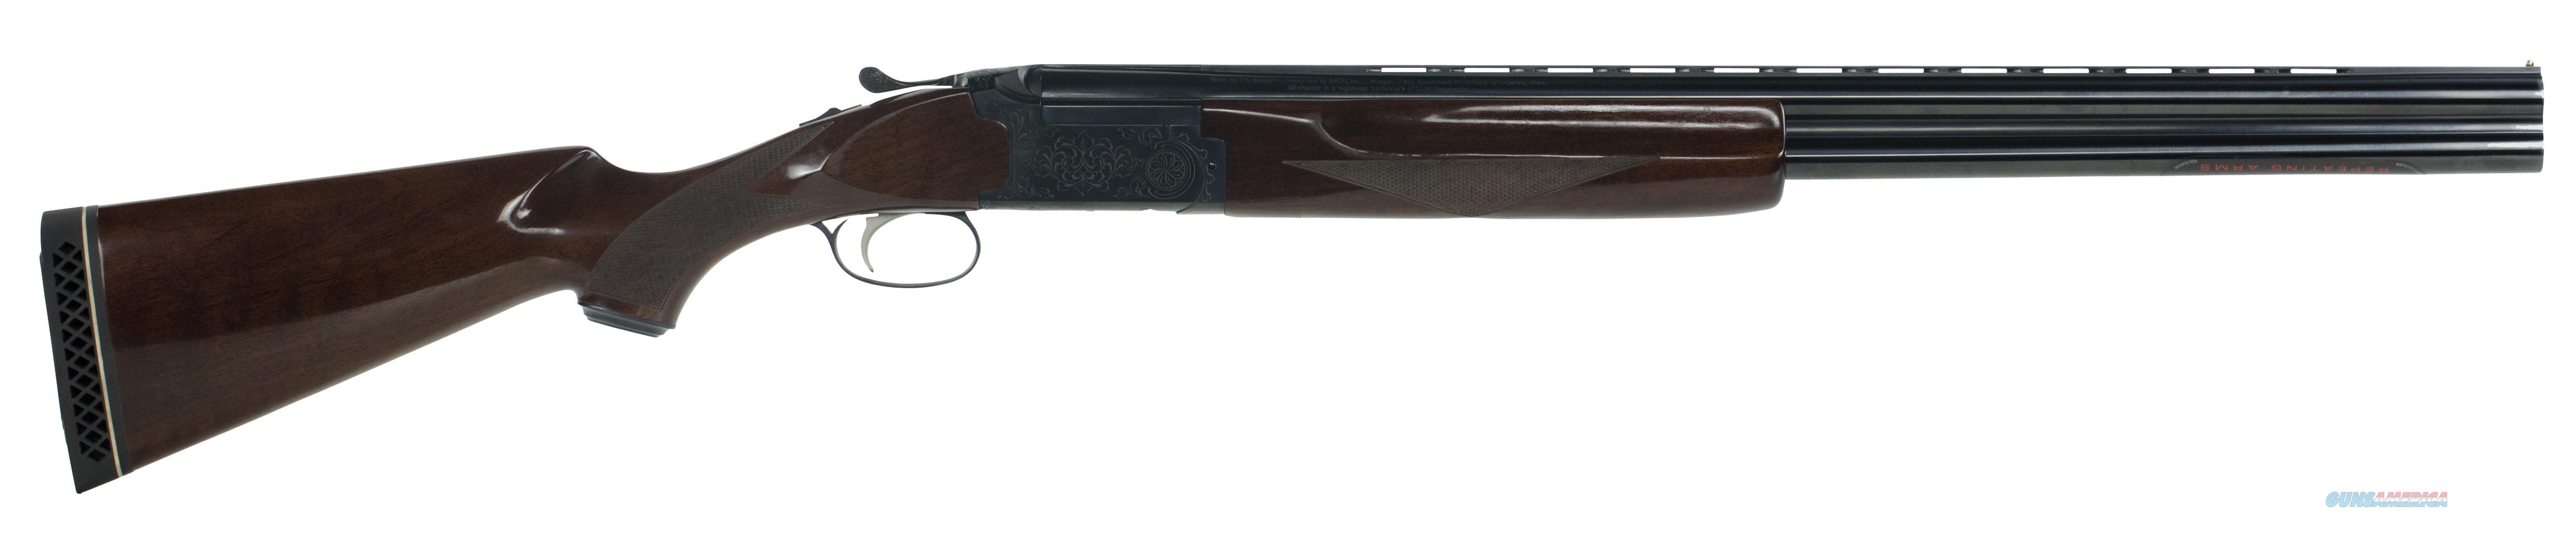 "Winchester Guns 513046371 101 Over/Under 12 Gauge 26"" 3"" Trukish Walnut Stk Blued Rcvr 513046371  Guns > Shotguns > W Misc Shotguns"